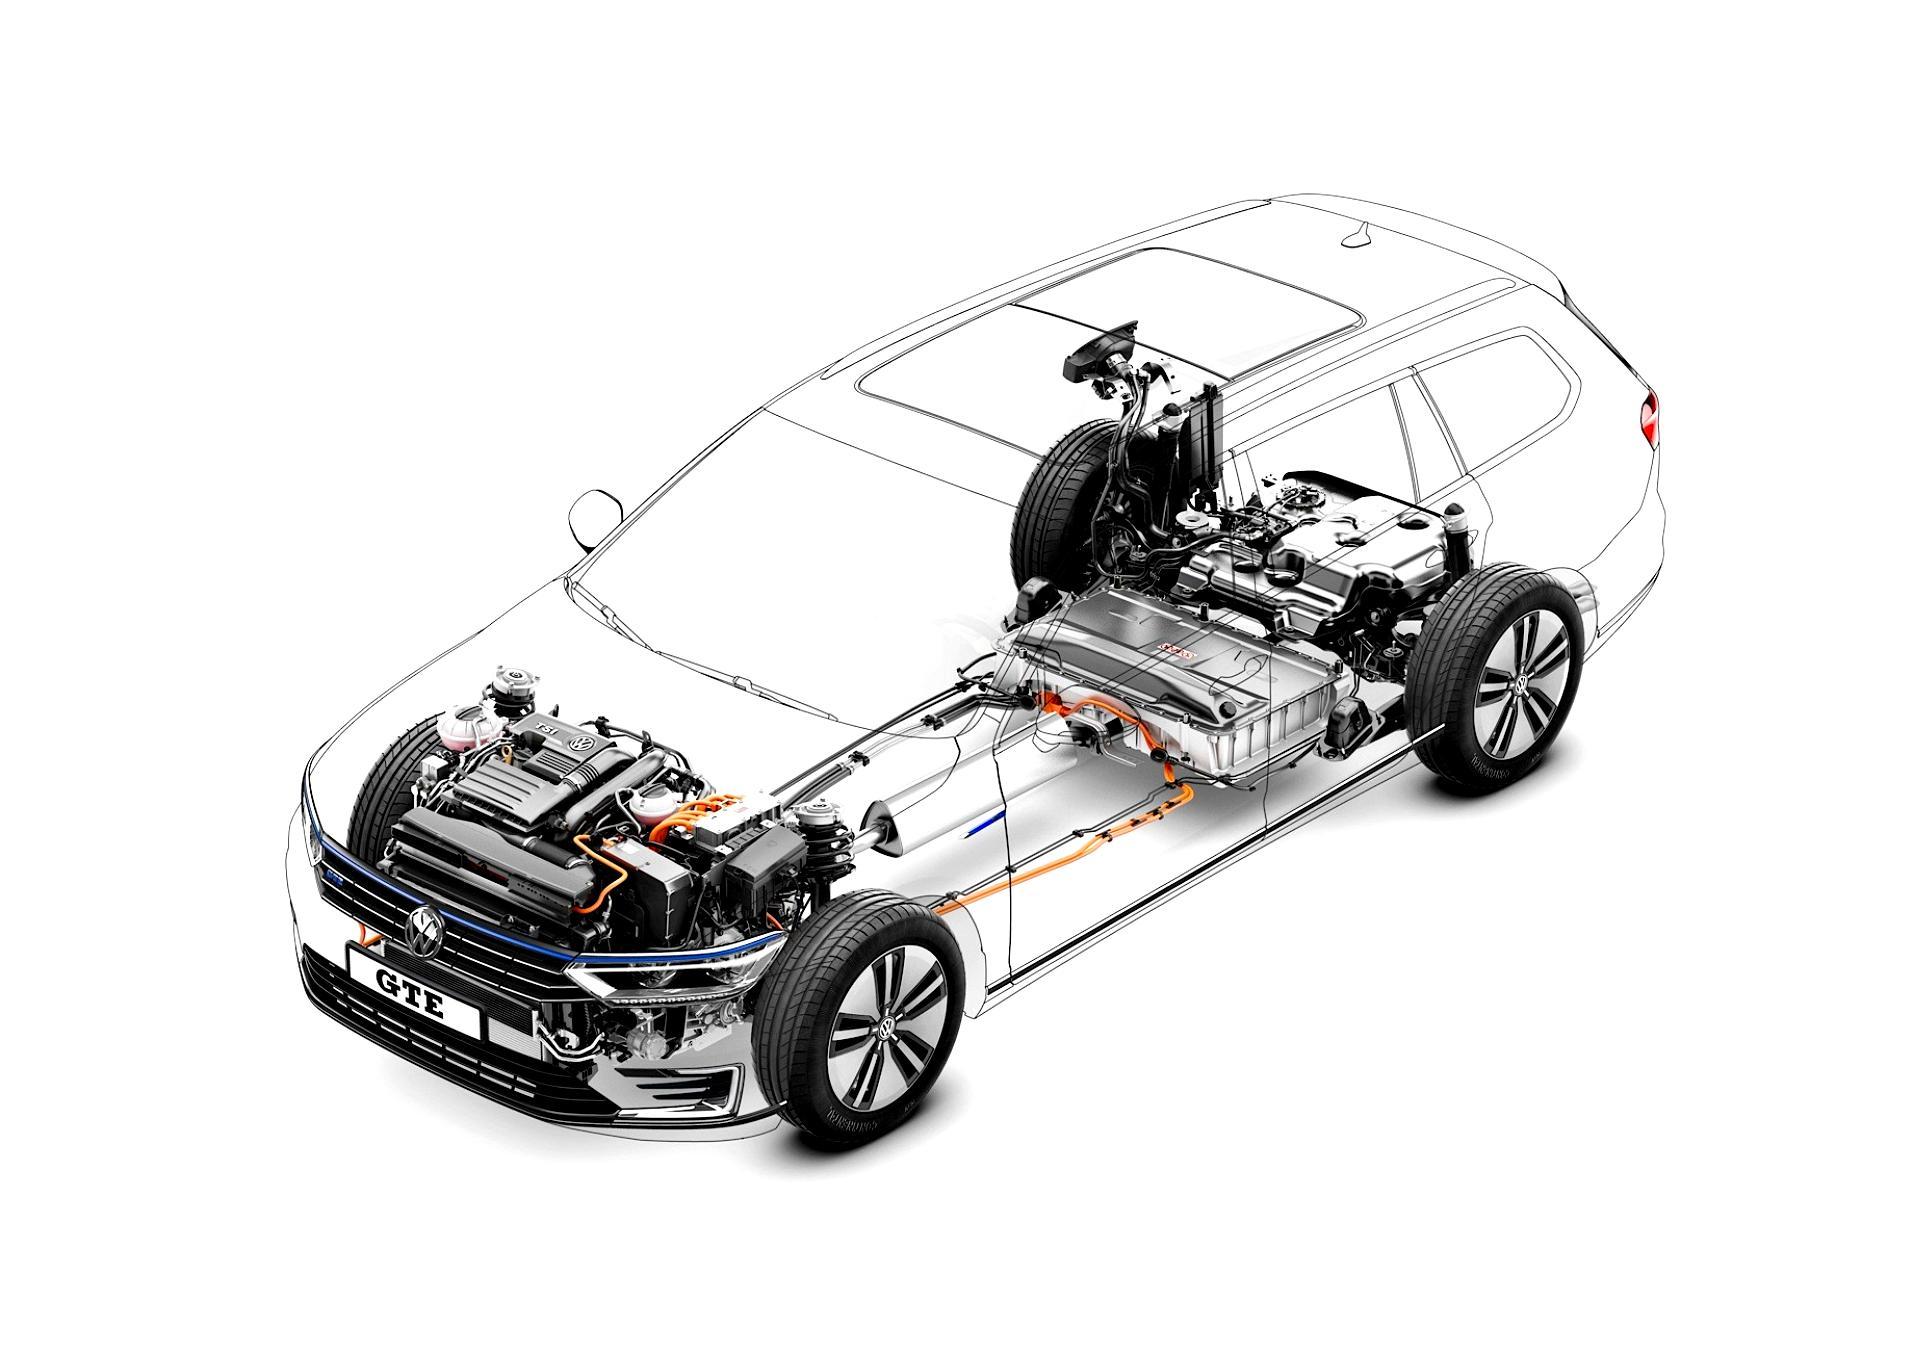 Volkswagen Passat Variant GTE 2015 on MotoImg.com